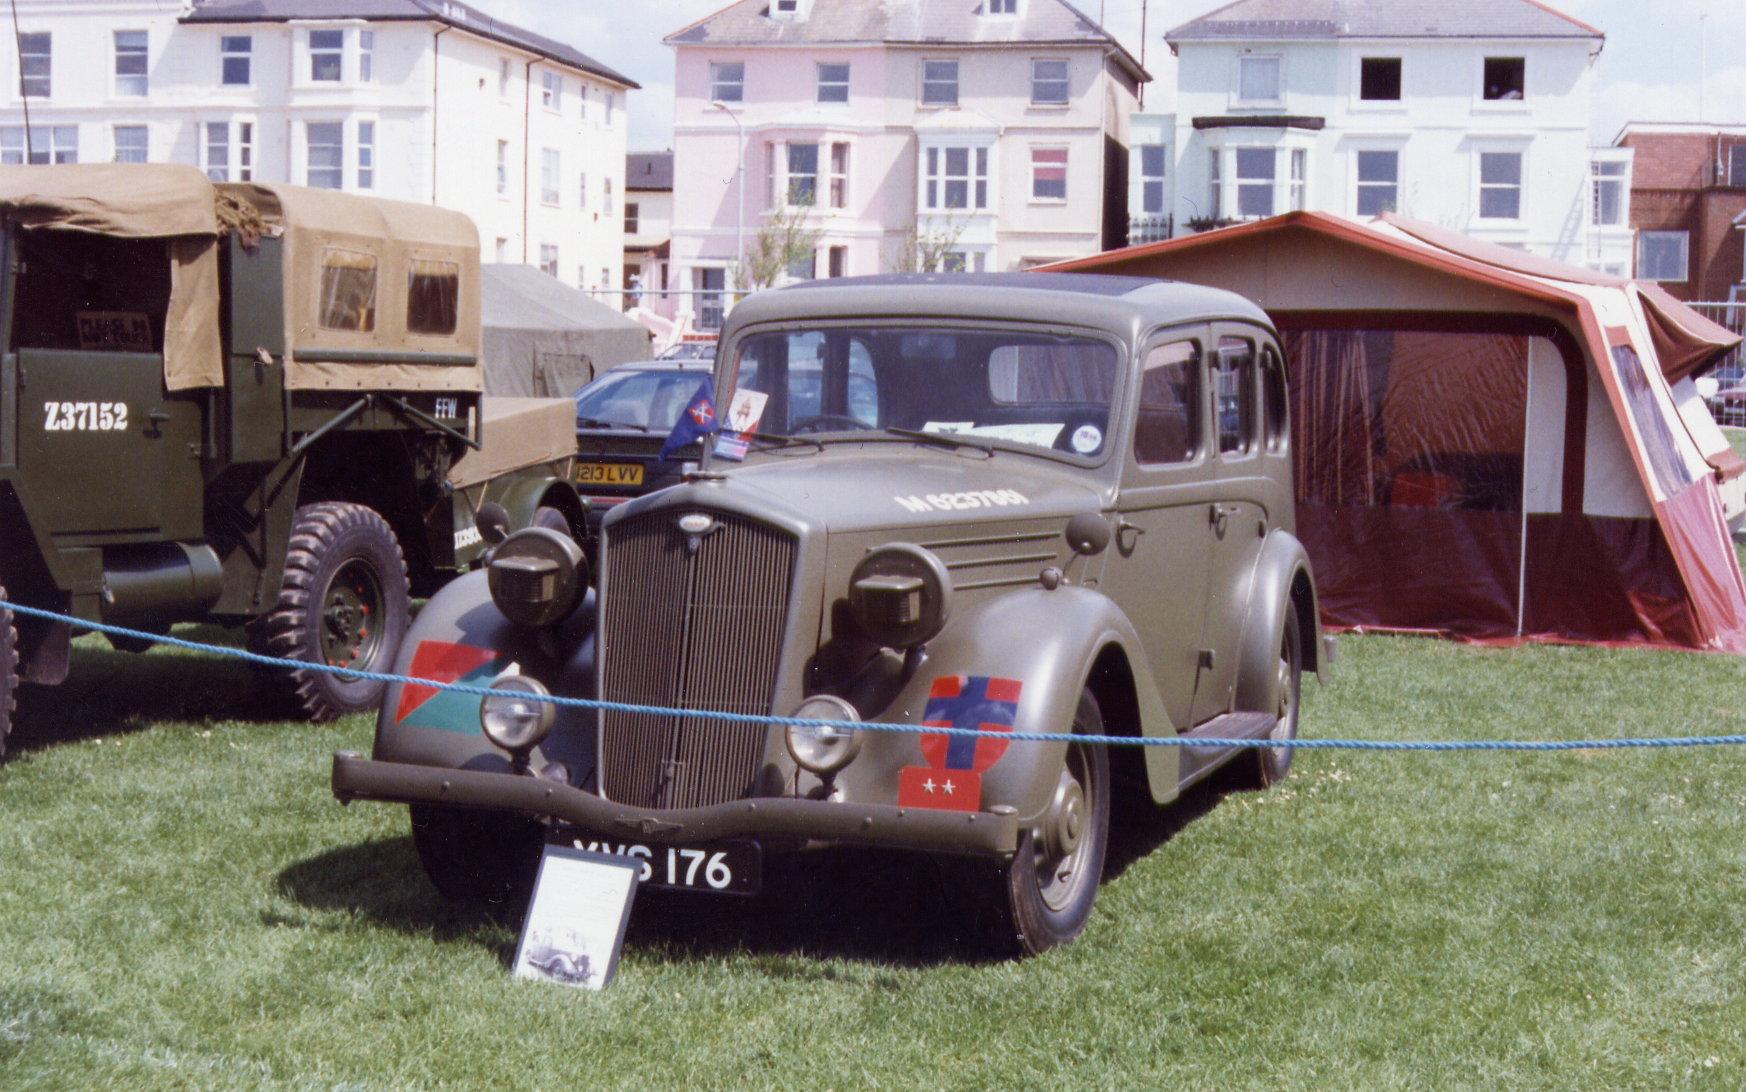 wolseley-25hp-staff-car-xvs-176.jpg